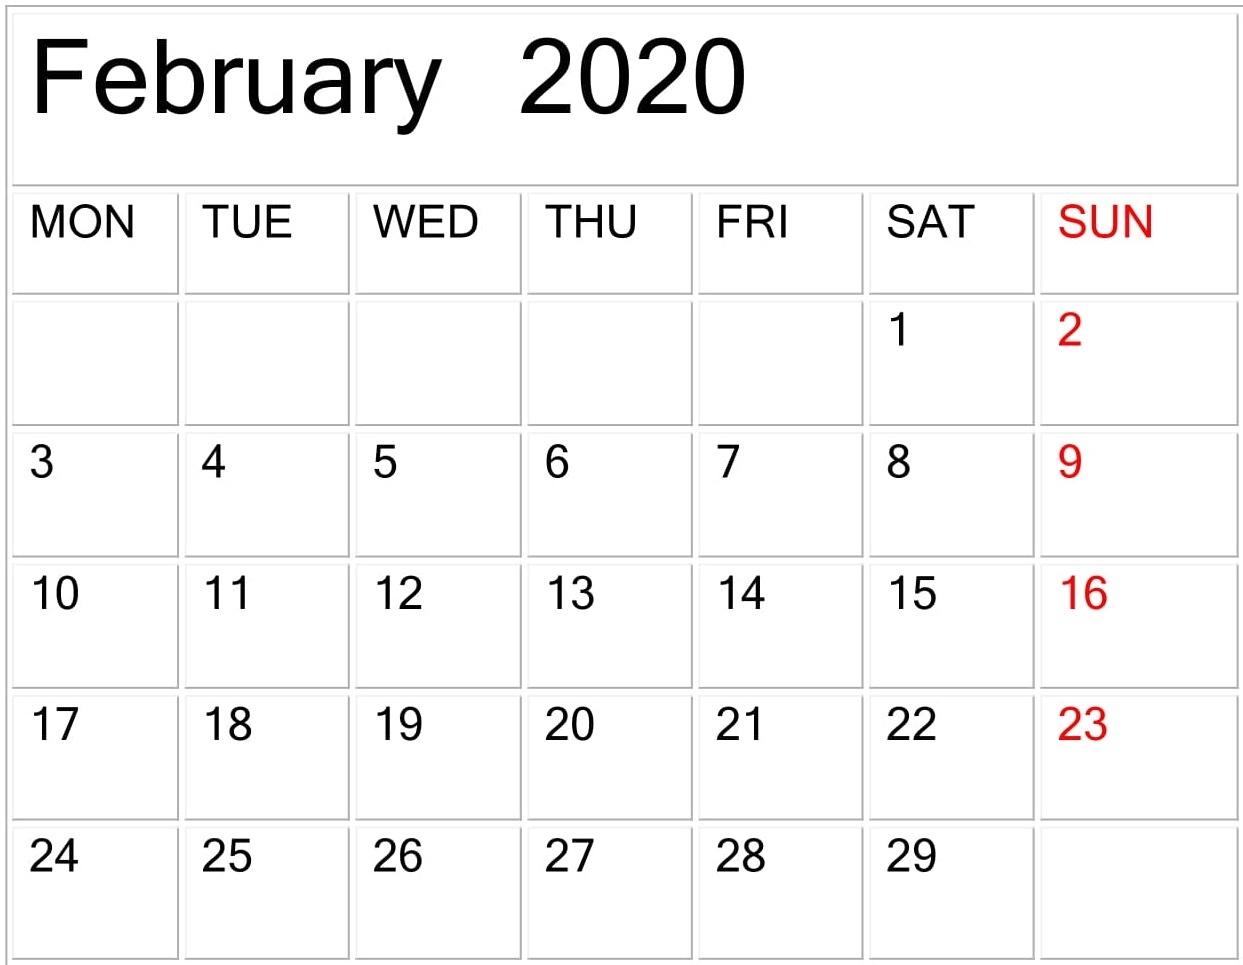 February 2020 Calendar Template Large Print - Latest Calendar Template To Print Free